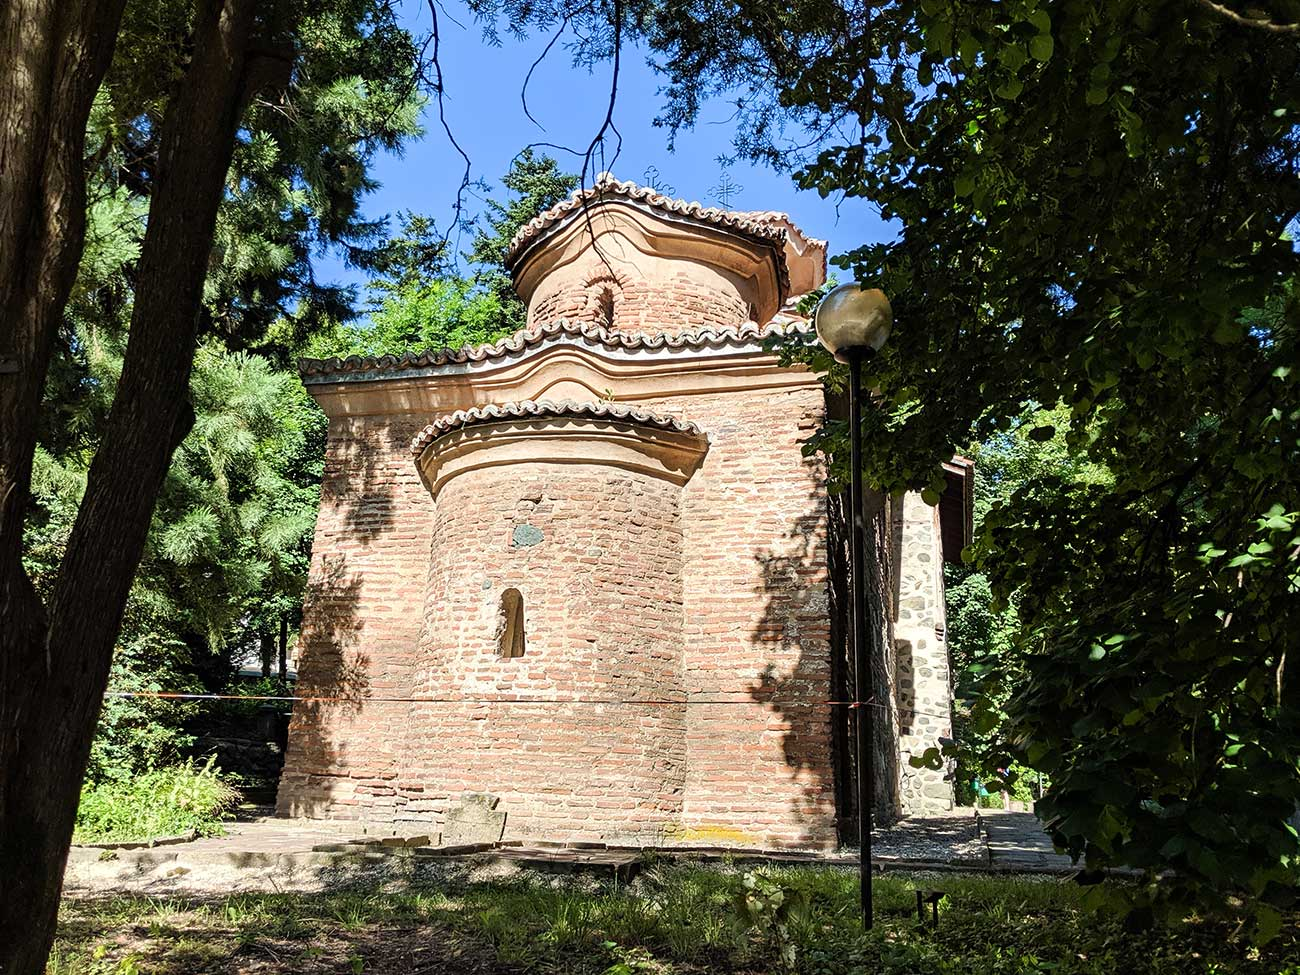 Back of Boyana Church through the trees